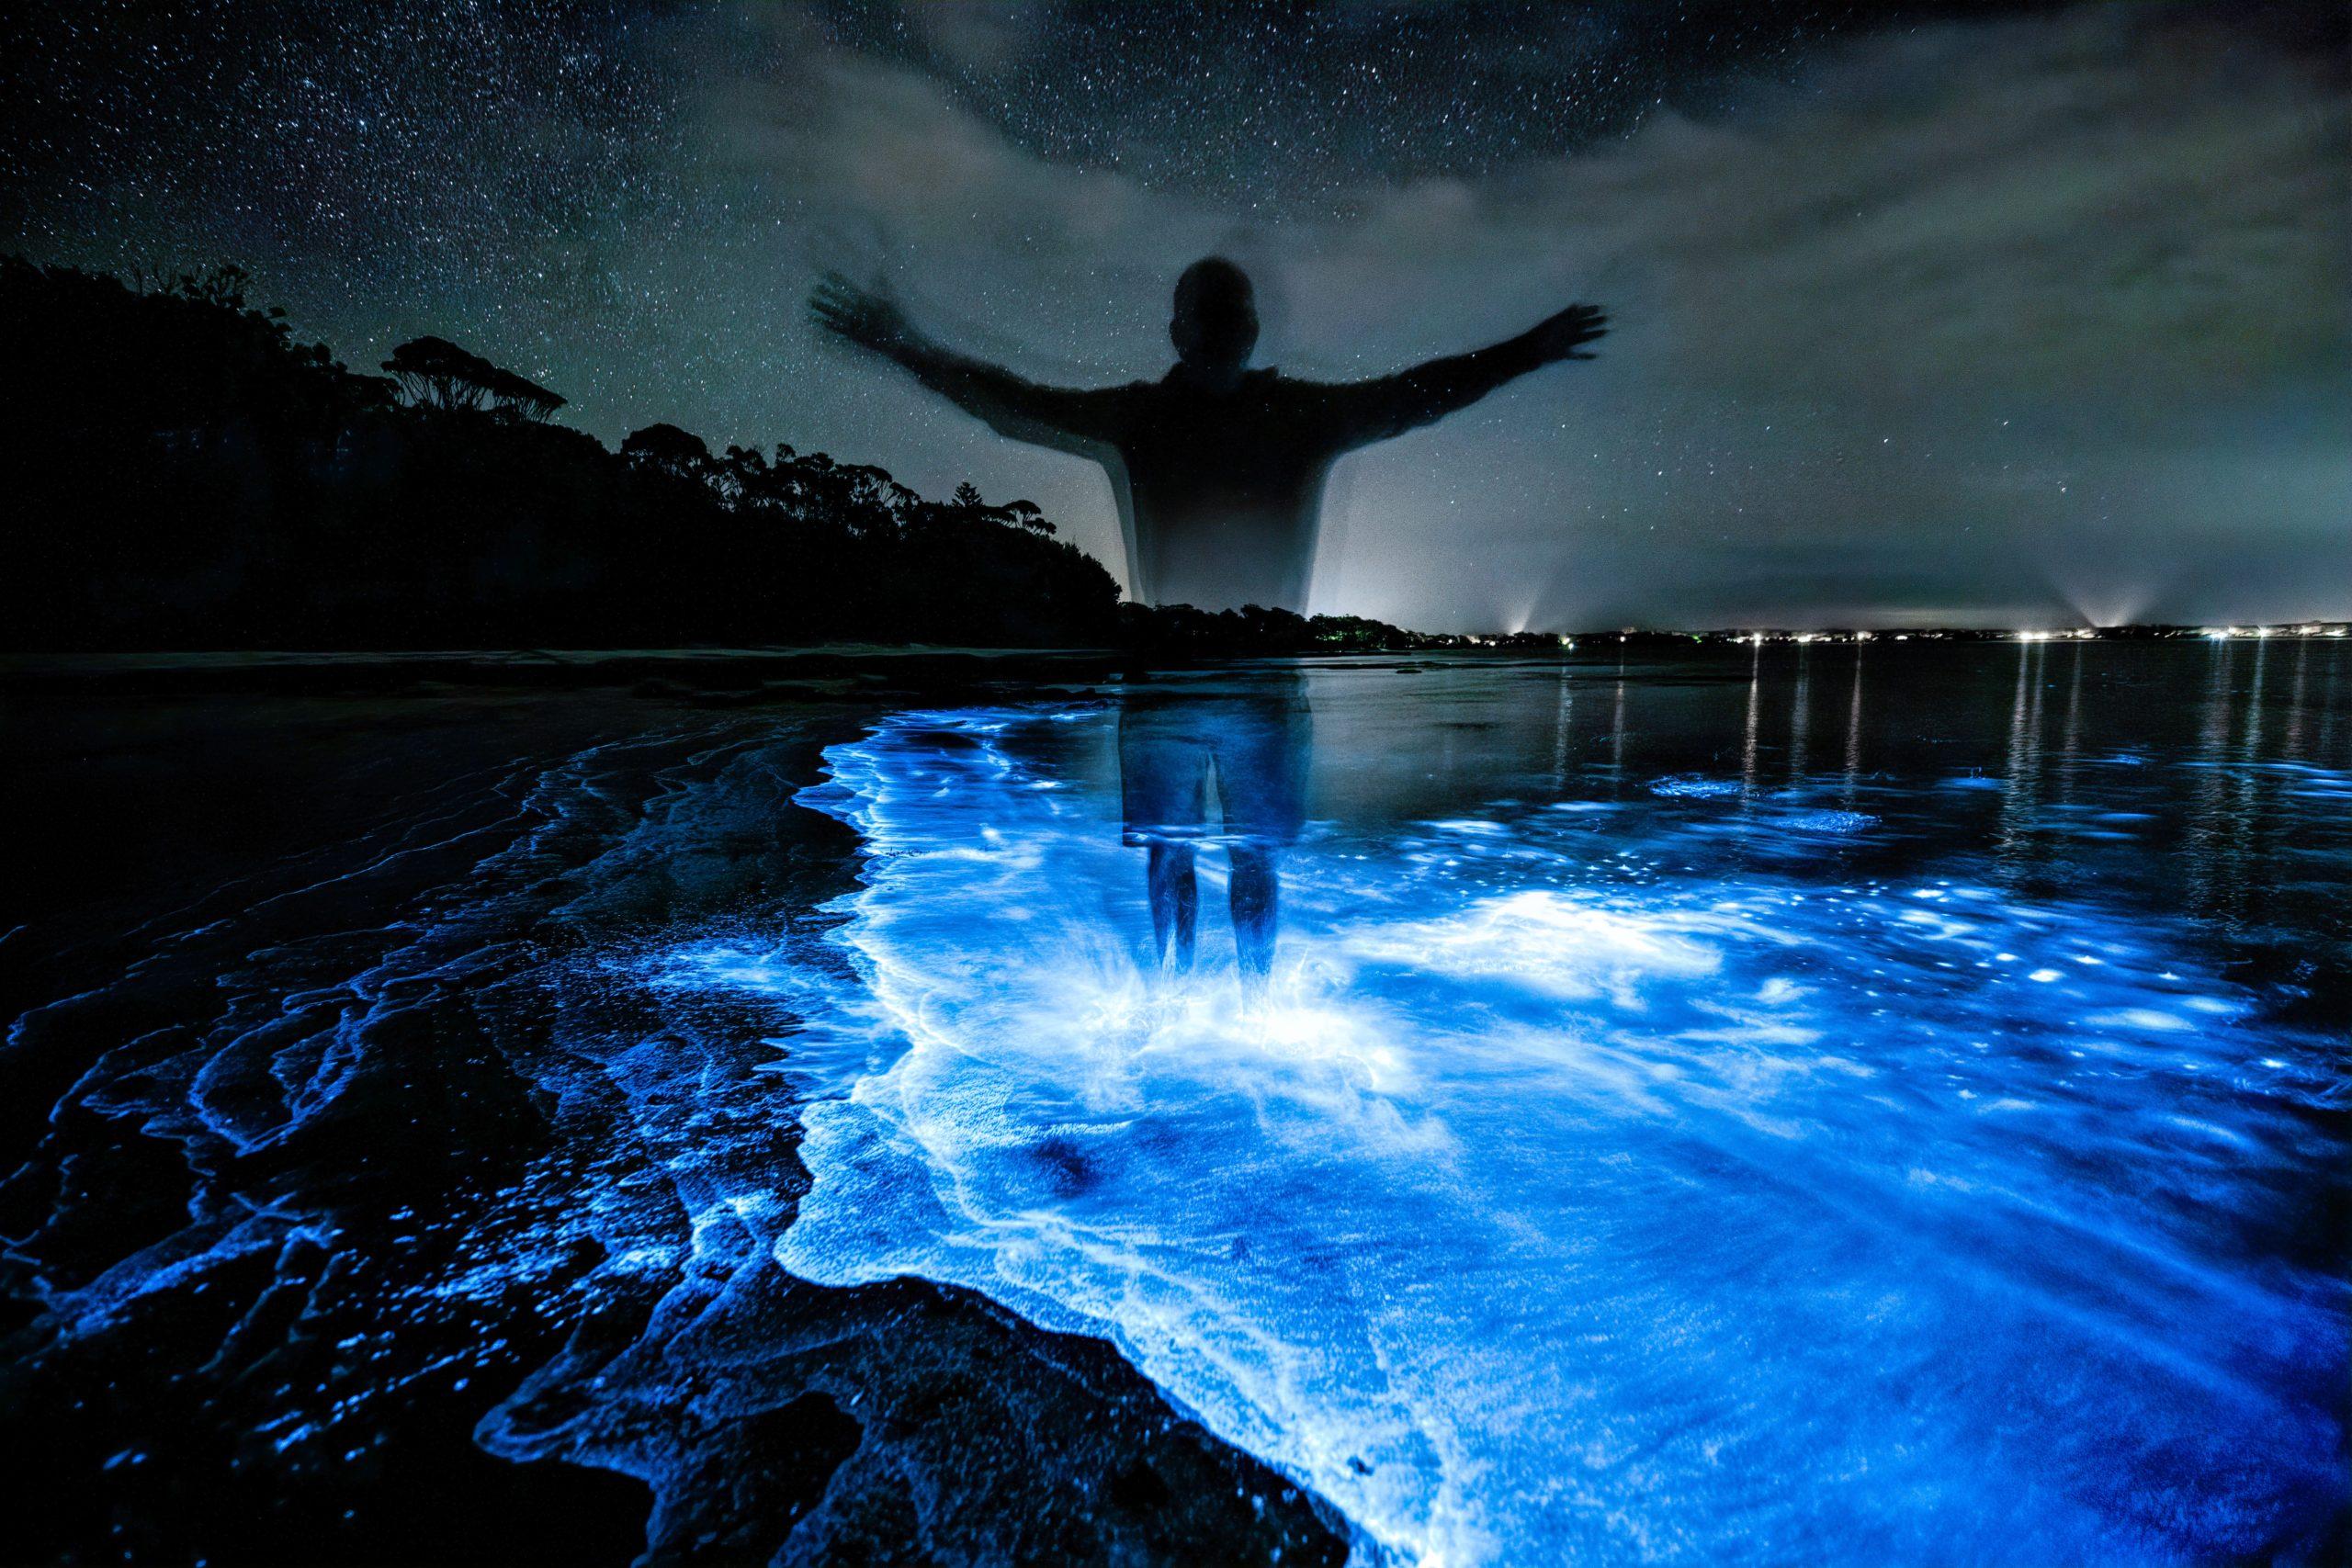 Bioluminescence Kayaking